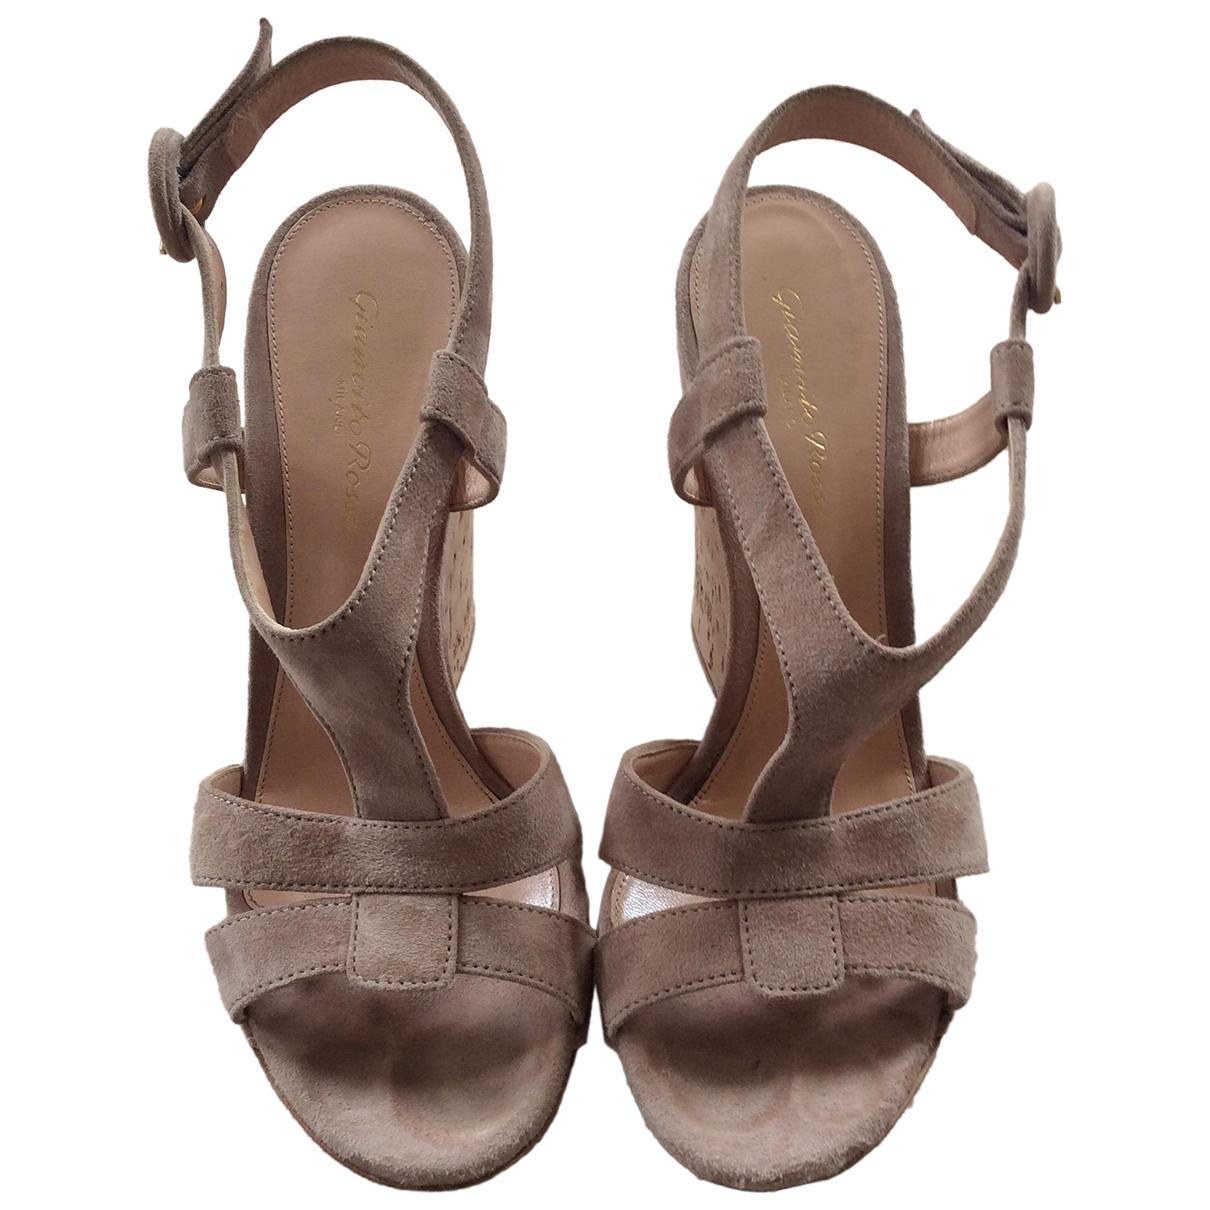 Gianvito Rossi \N Beige Suede Sandals for Women 38 EU